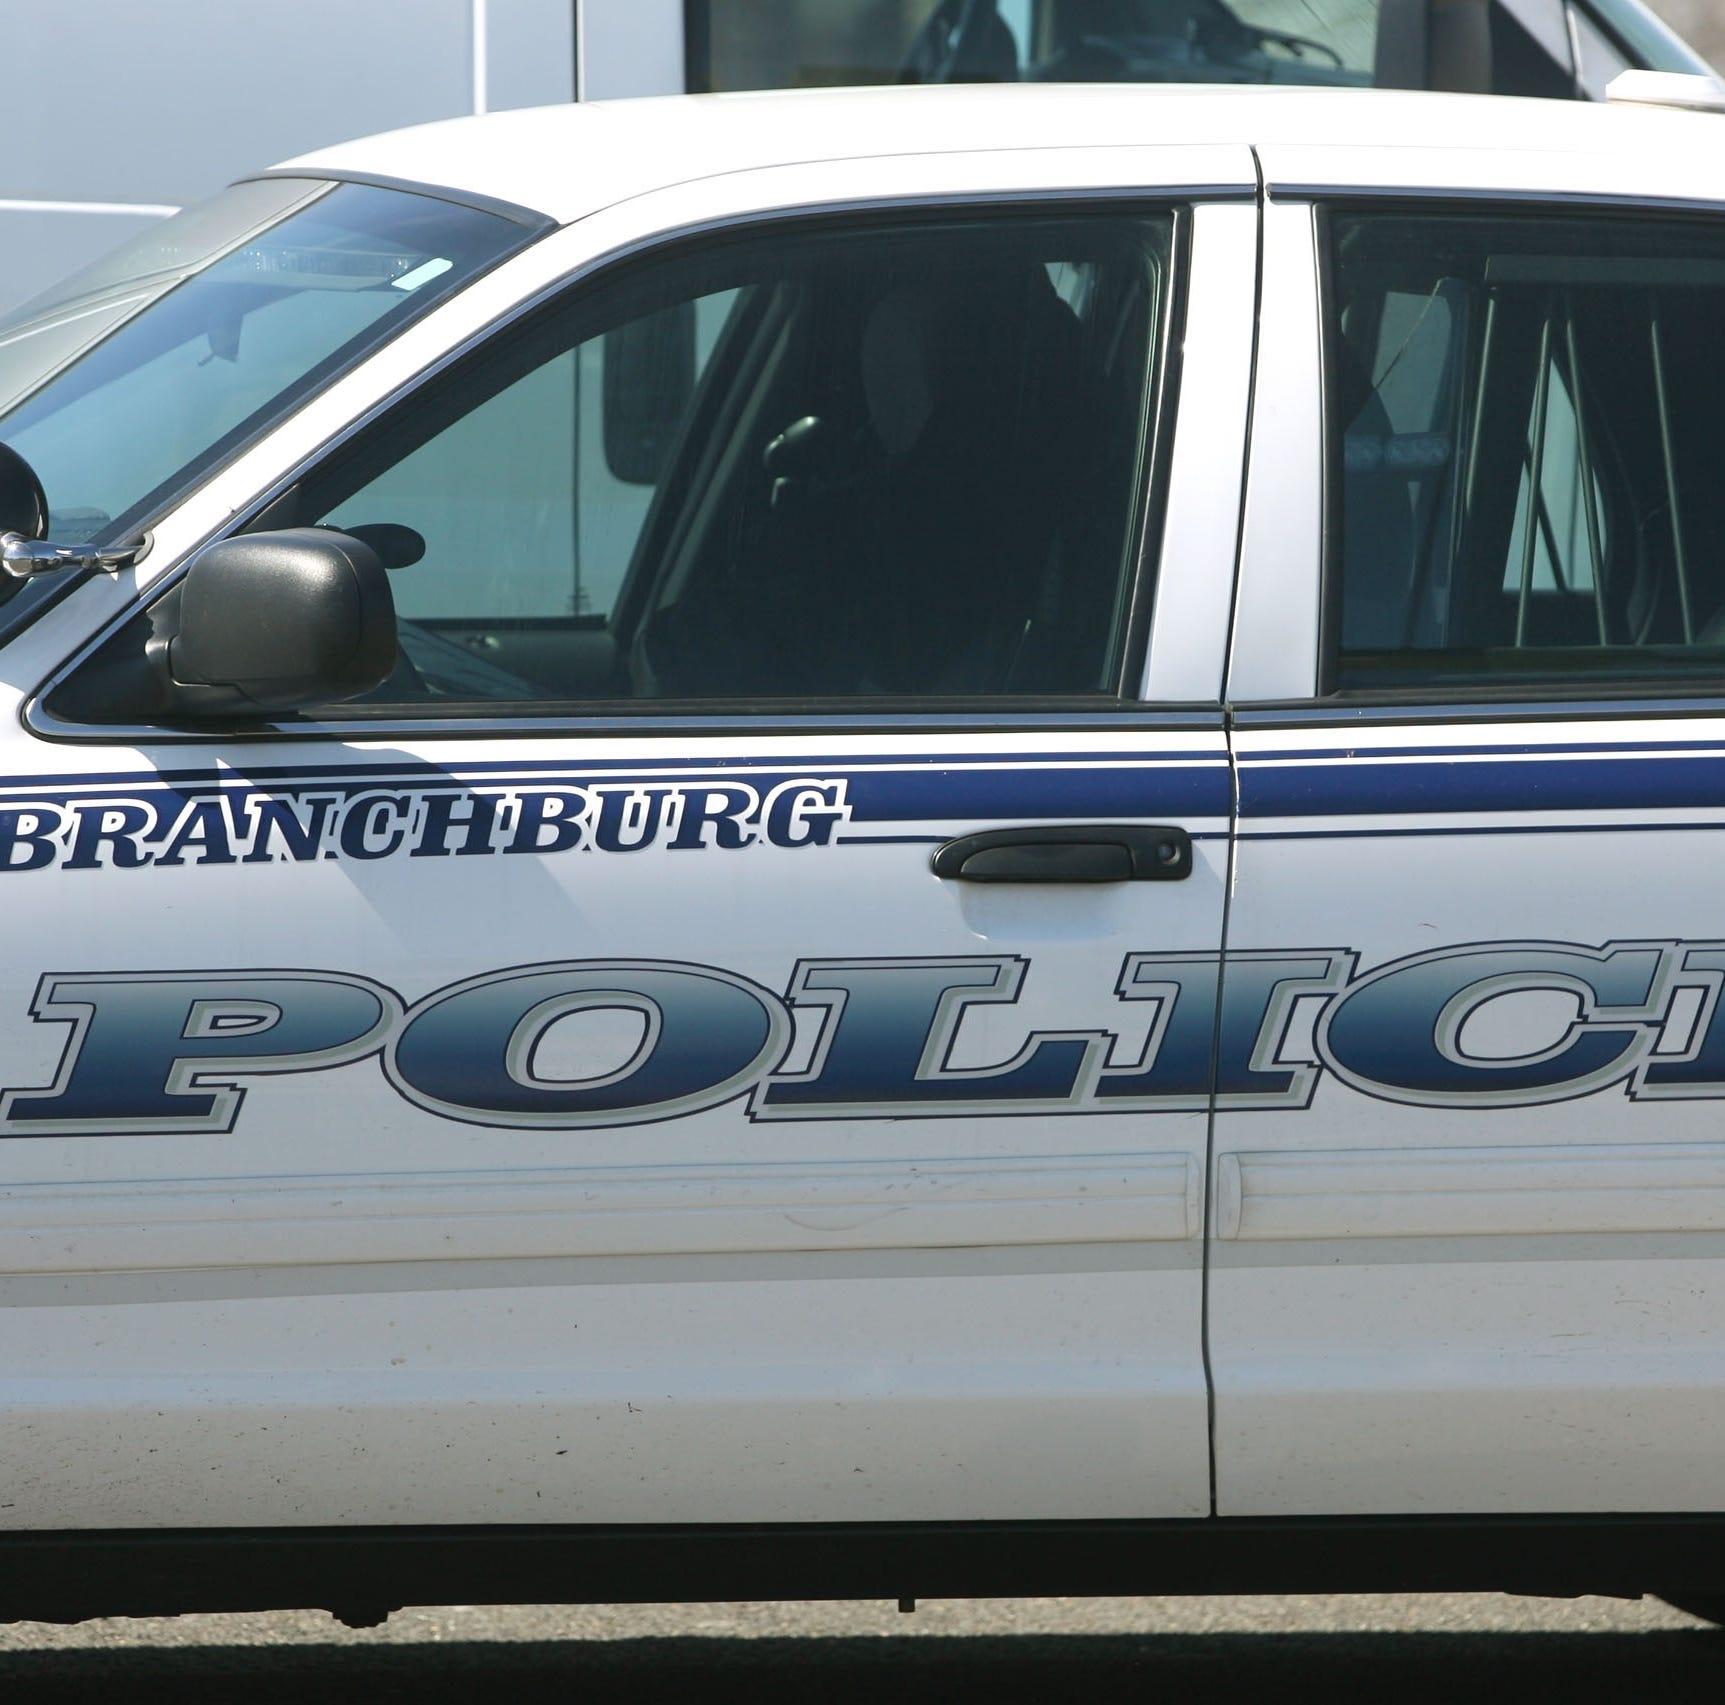 Branchburg police officer alleges sexual harassment, discrimination, retaliation in lawsuit